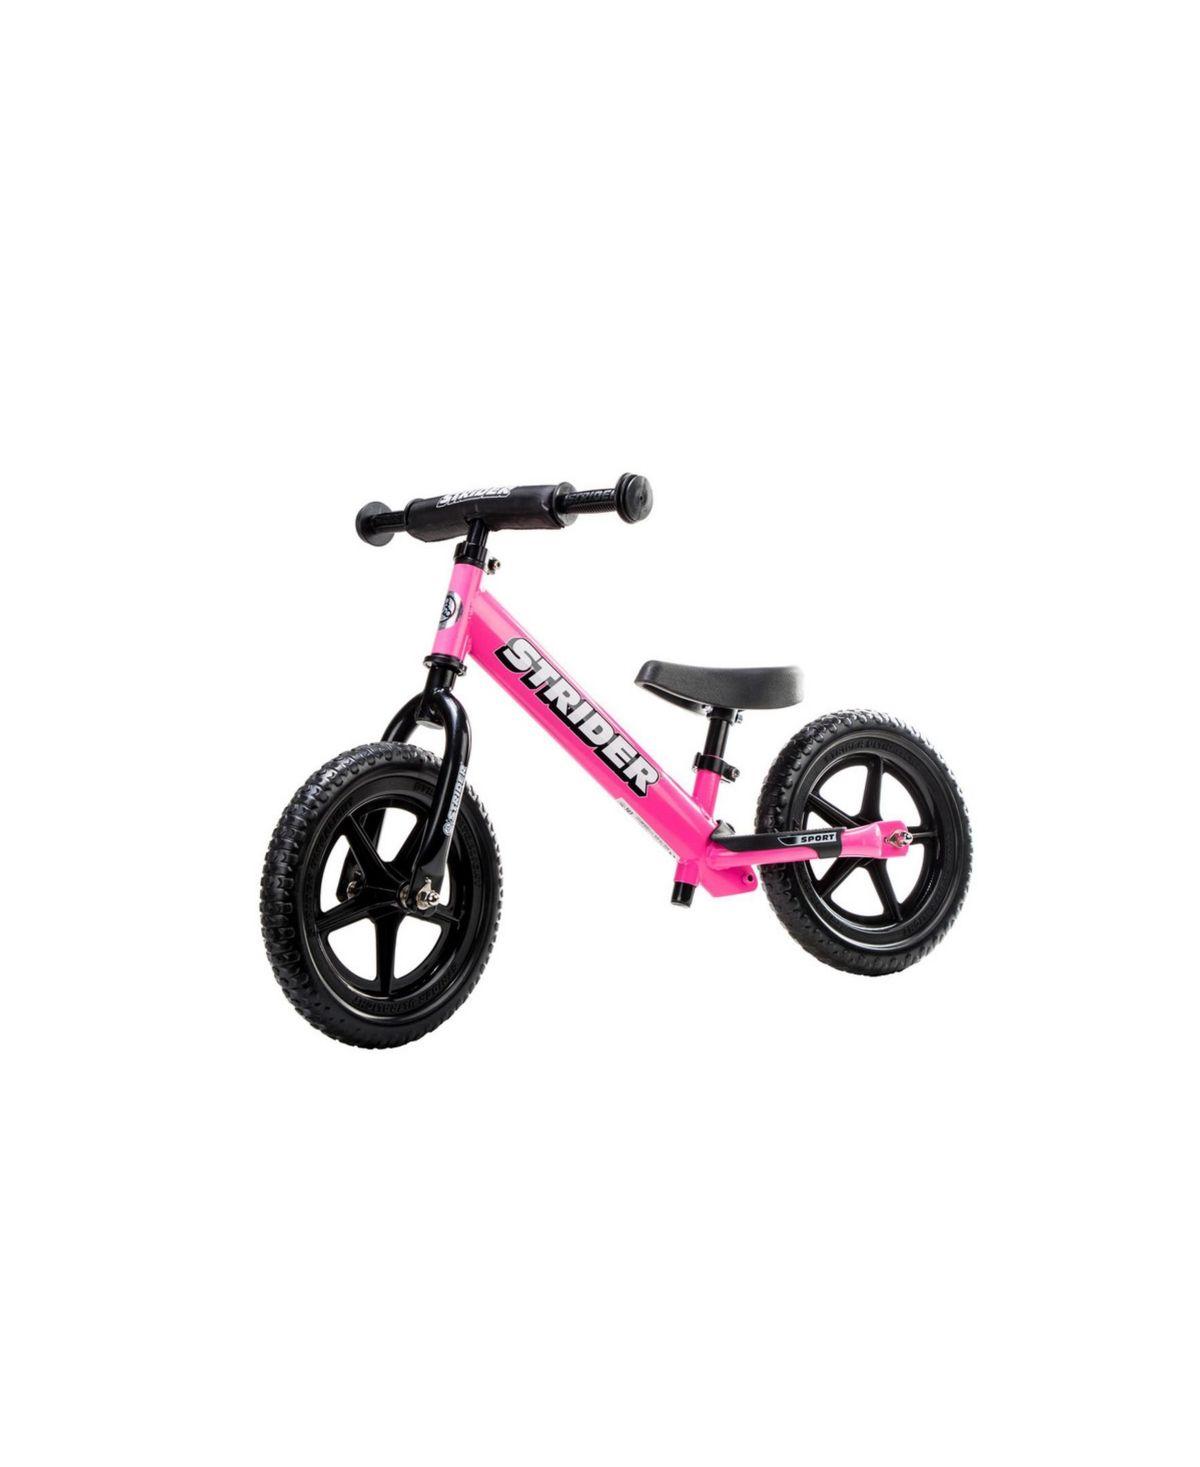 STRIDER 12 Sport Balance Bike & Reviews Home Macy's